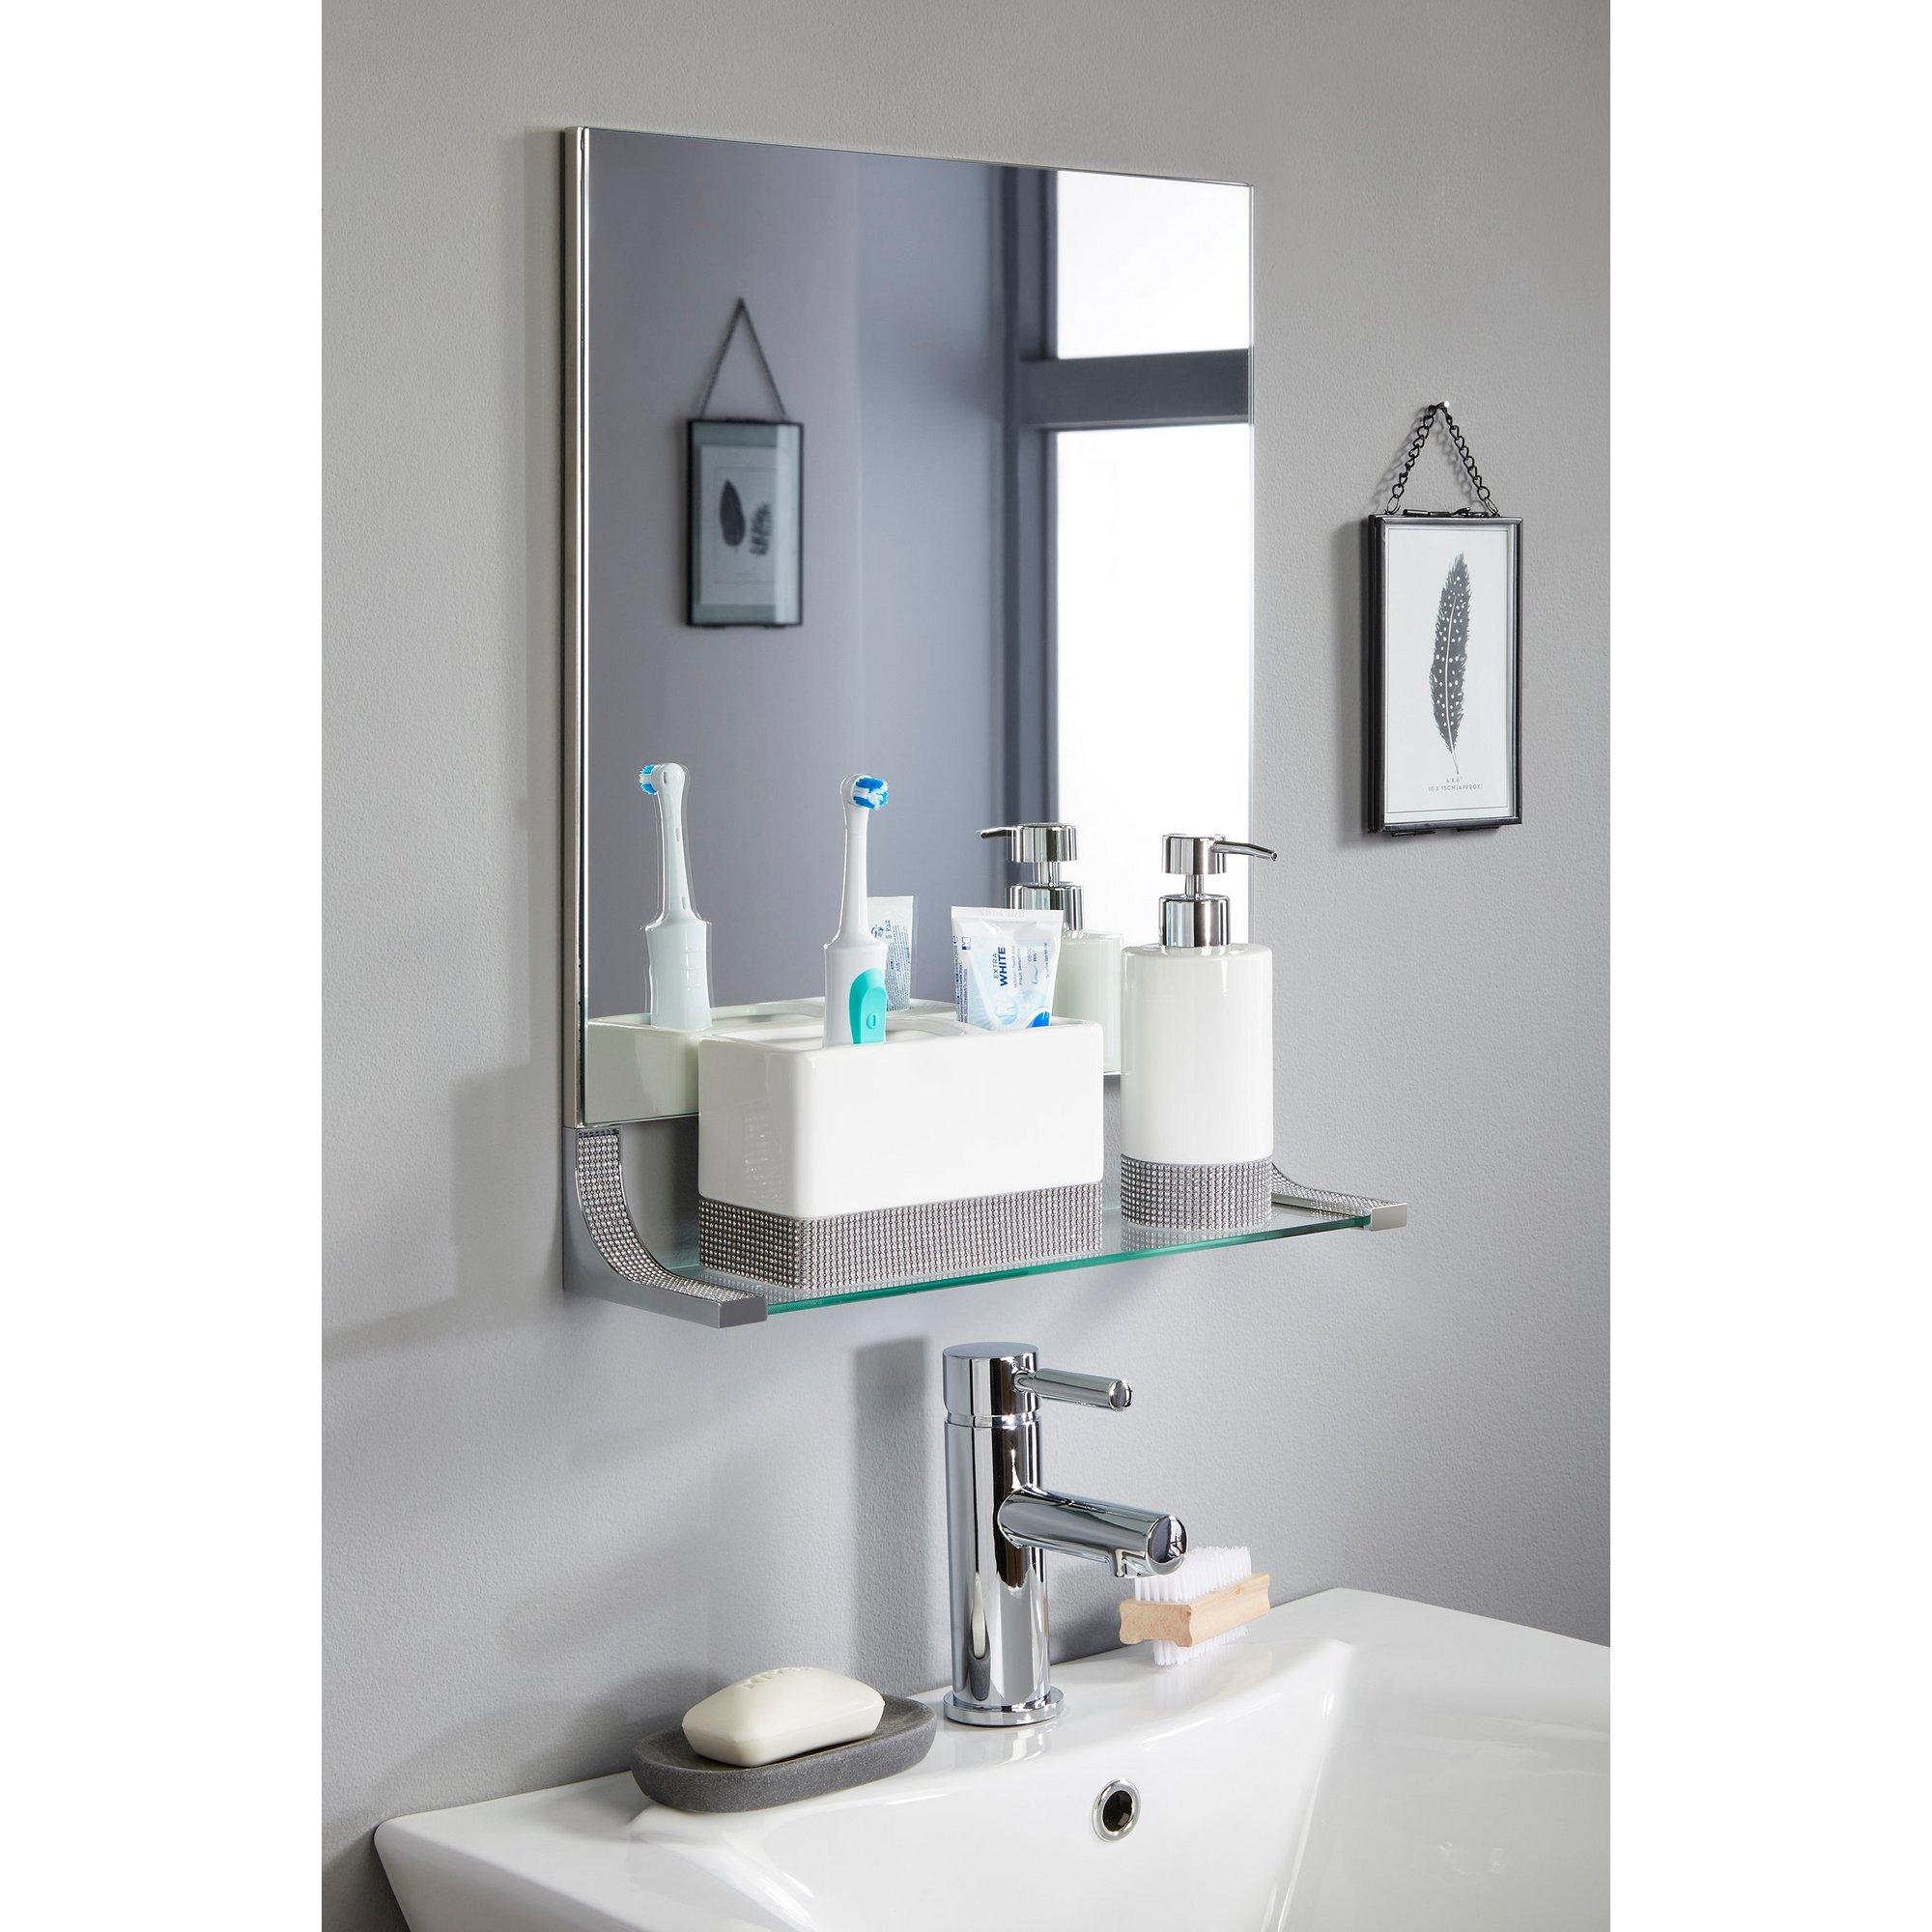 Image of Glamour Square Bathroom Mirror Shelf